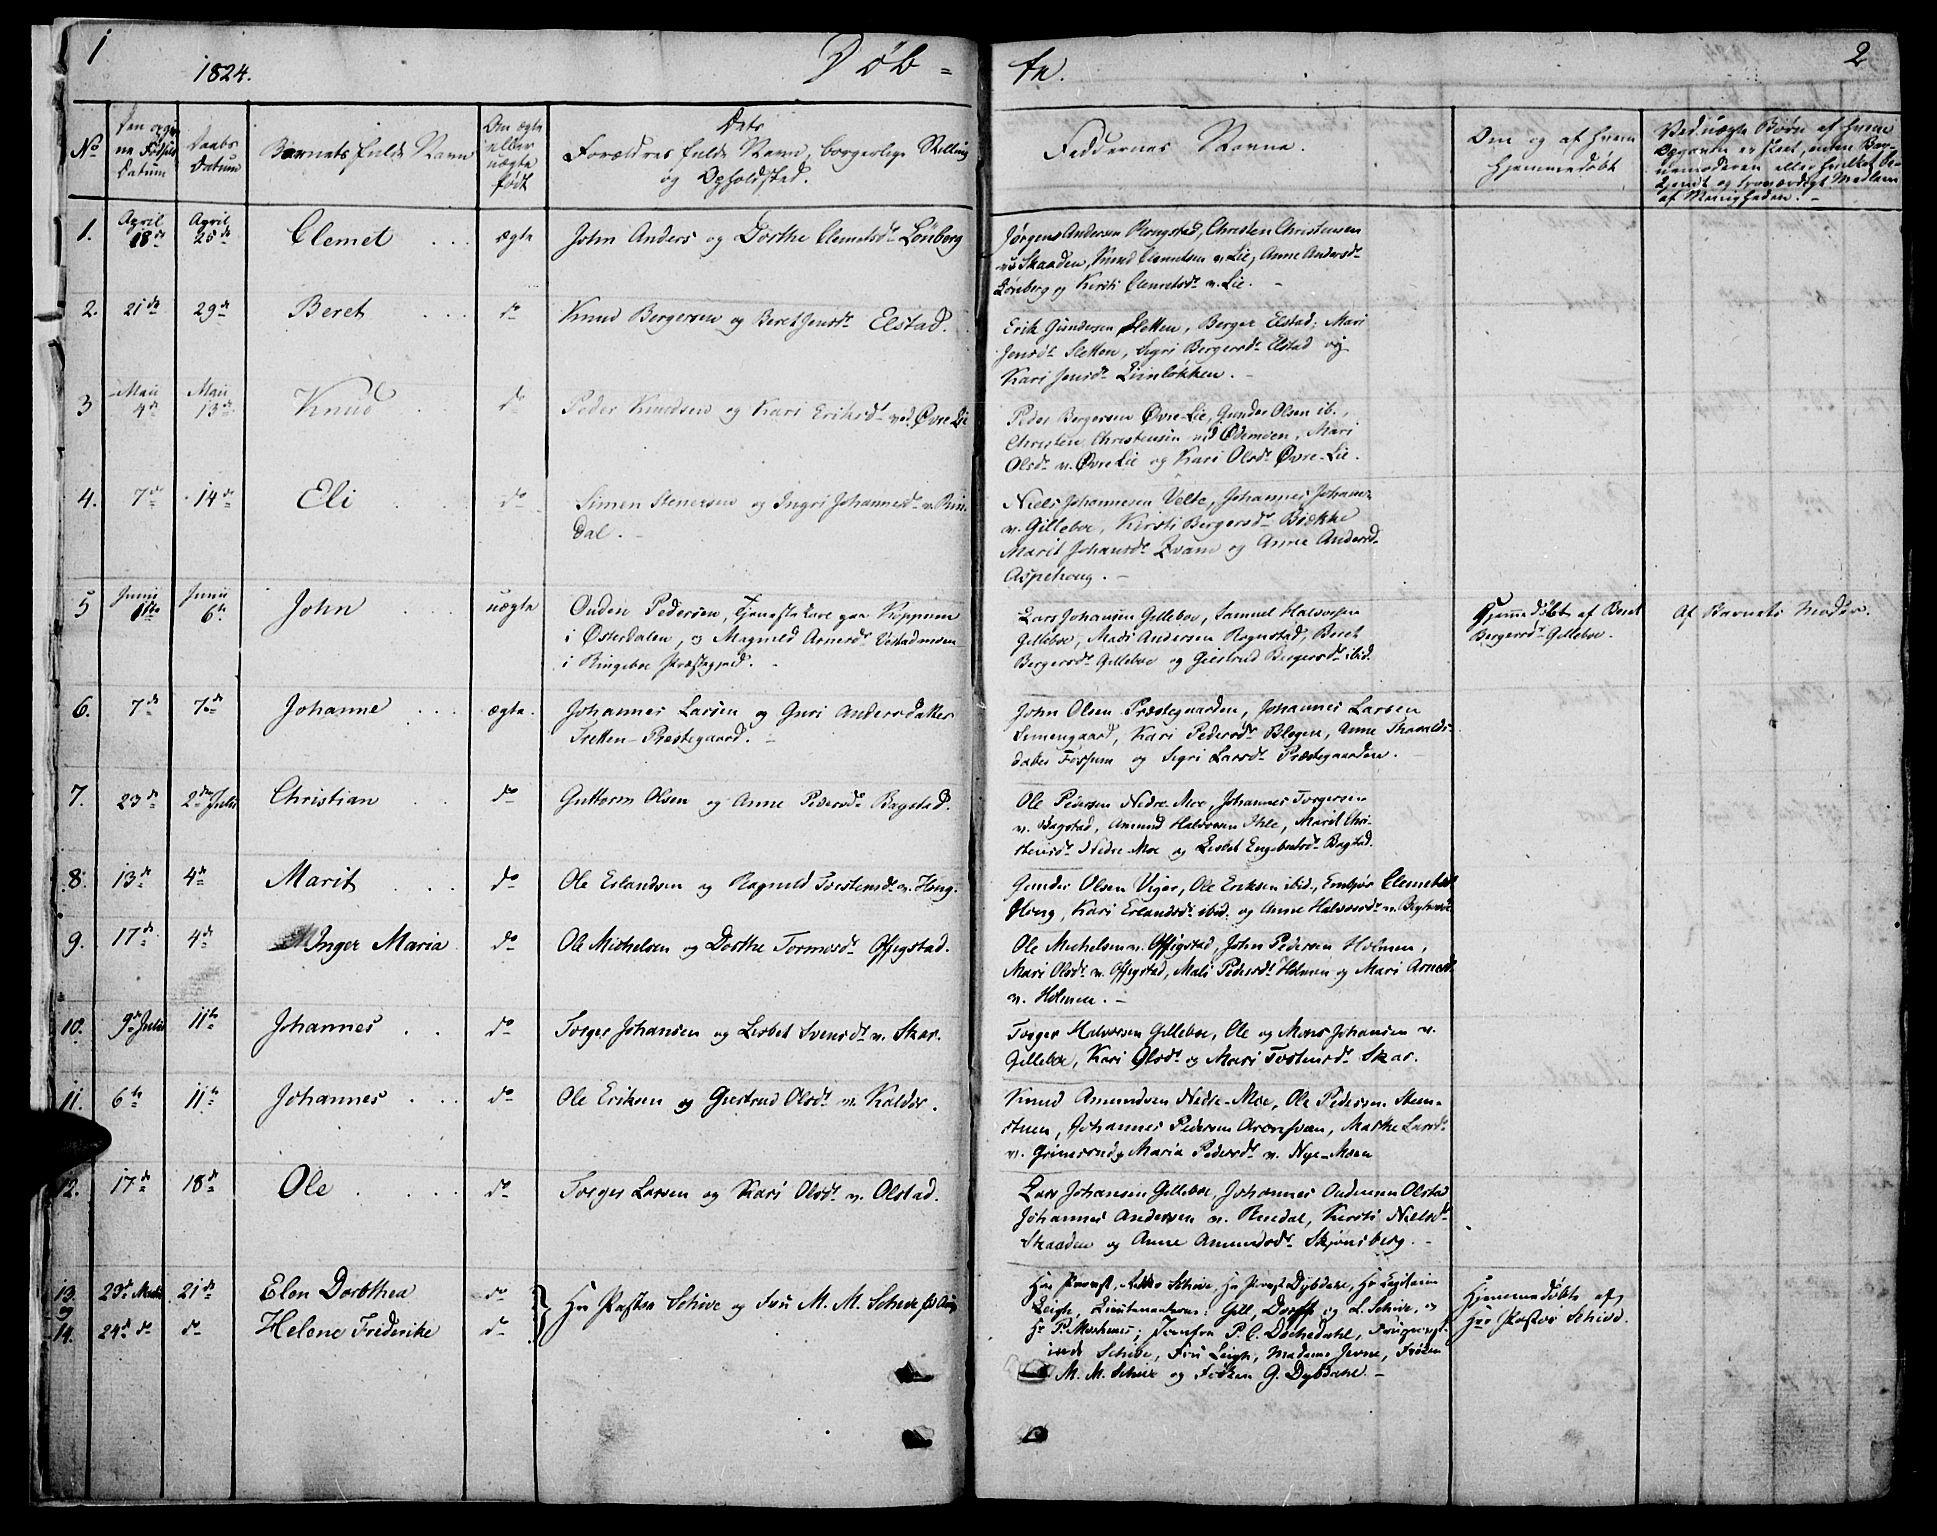 SAH, Øyer prestekontor, Ministerialbok nr. 4, 1824-1841, s. 1-2